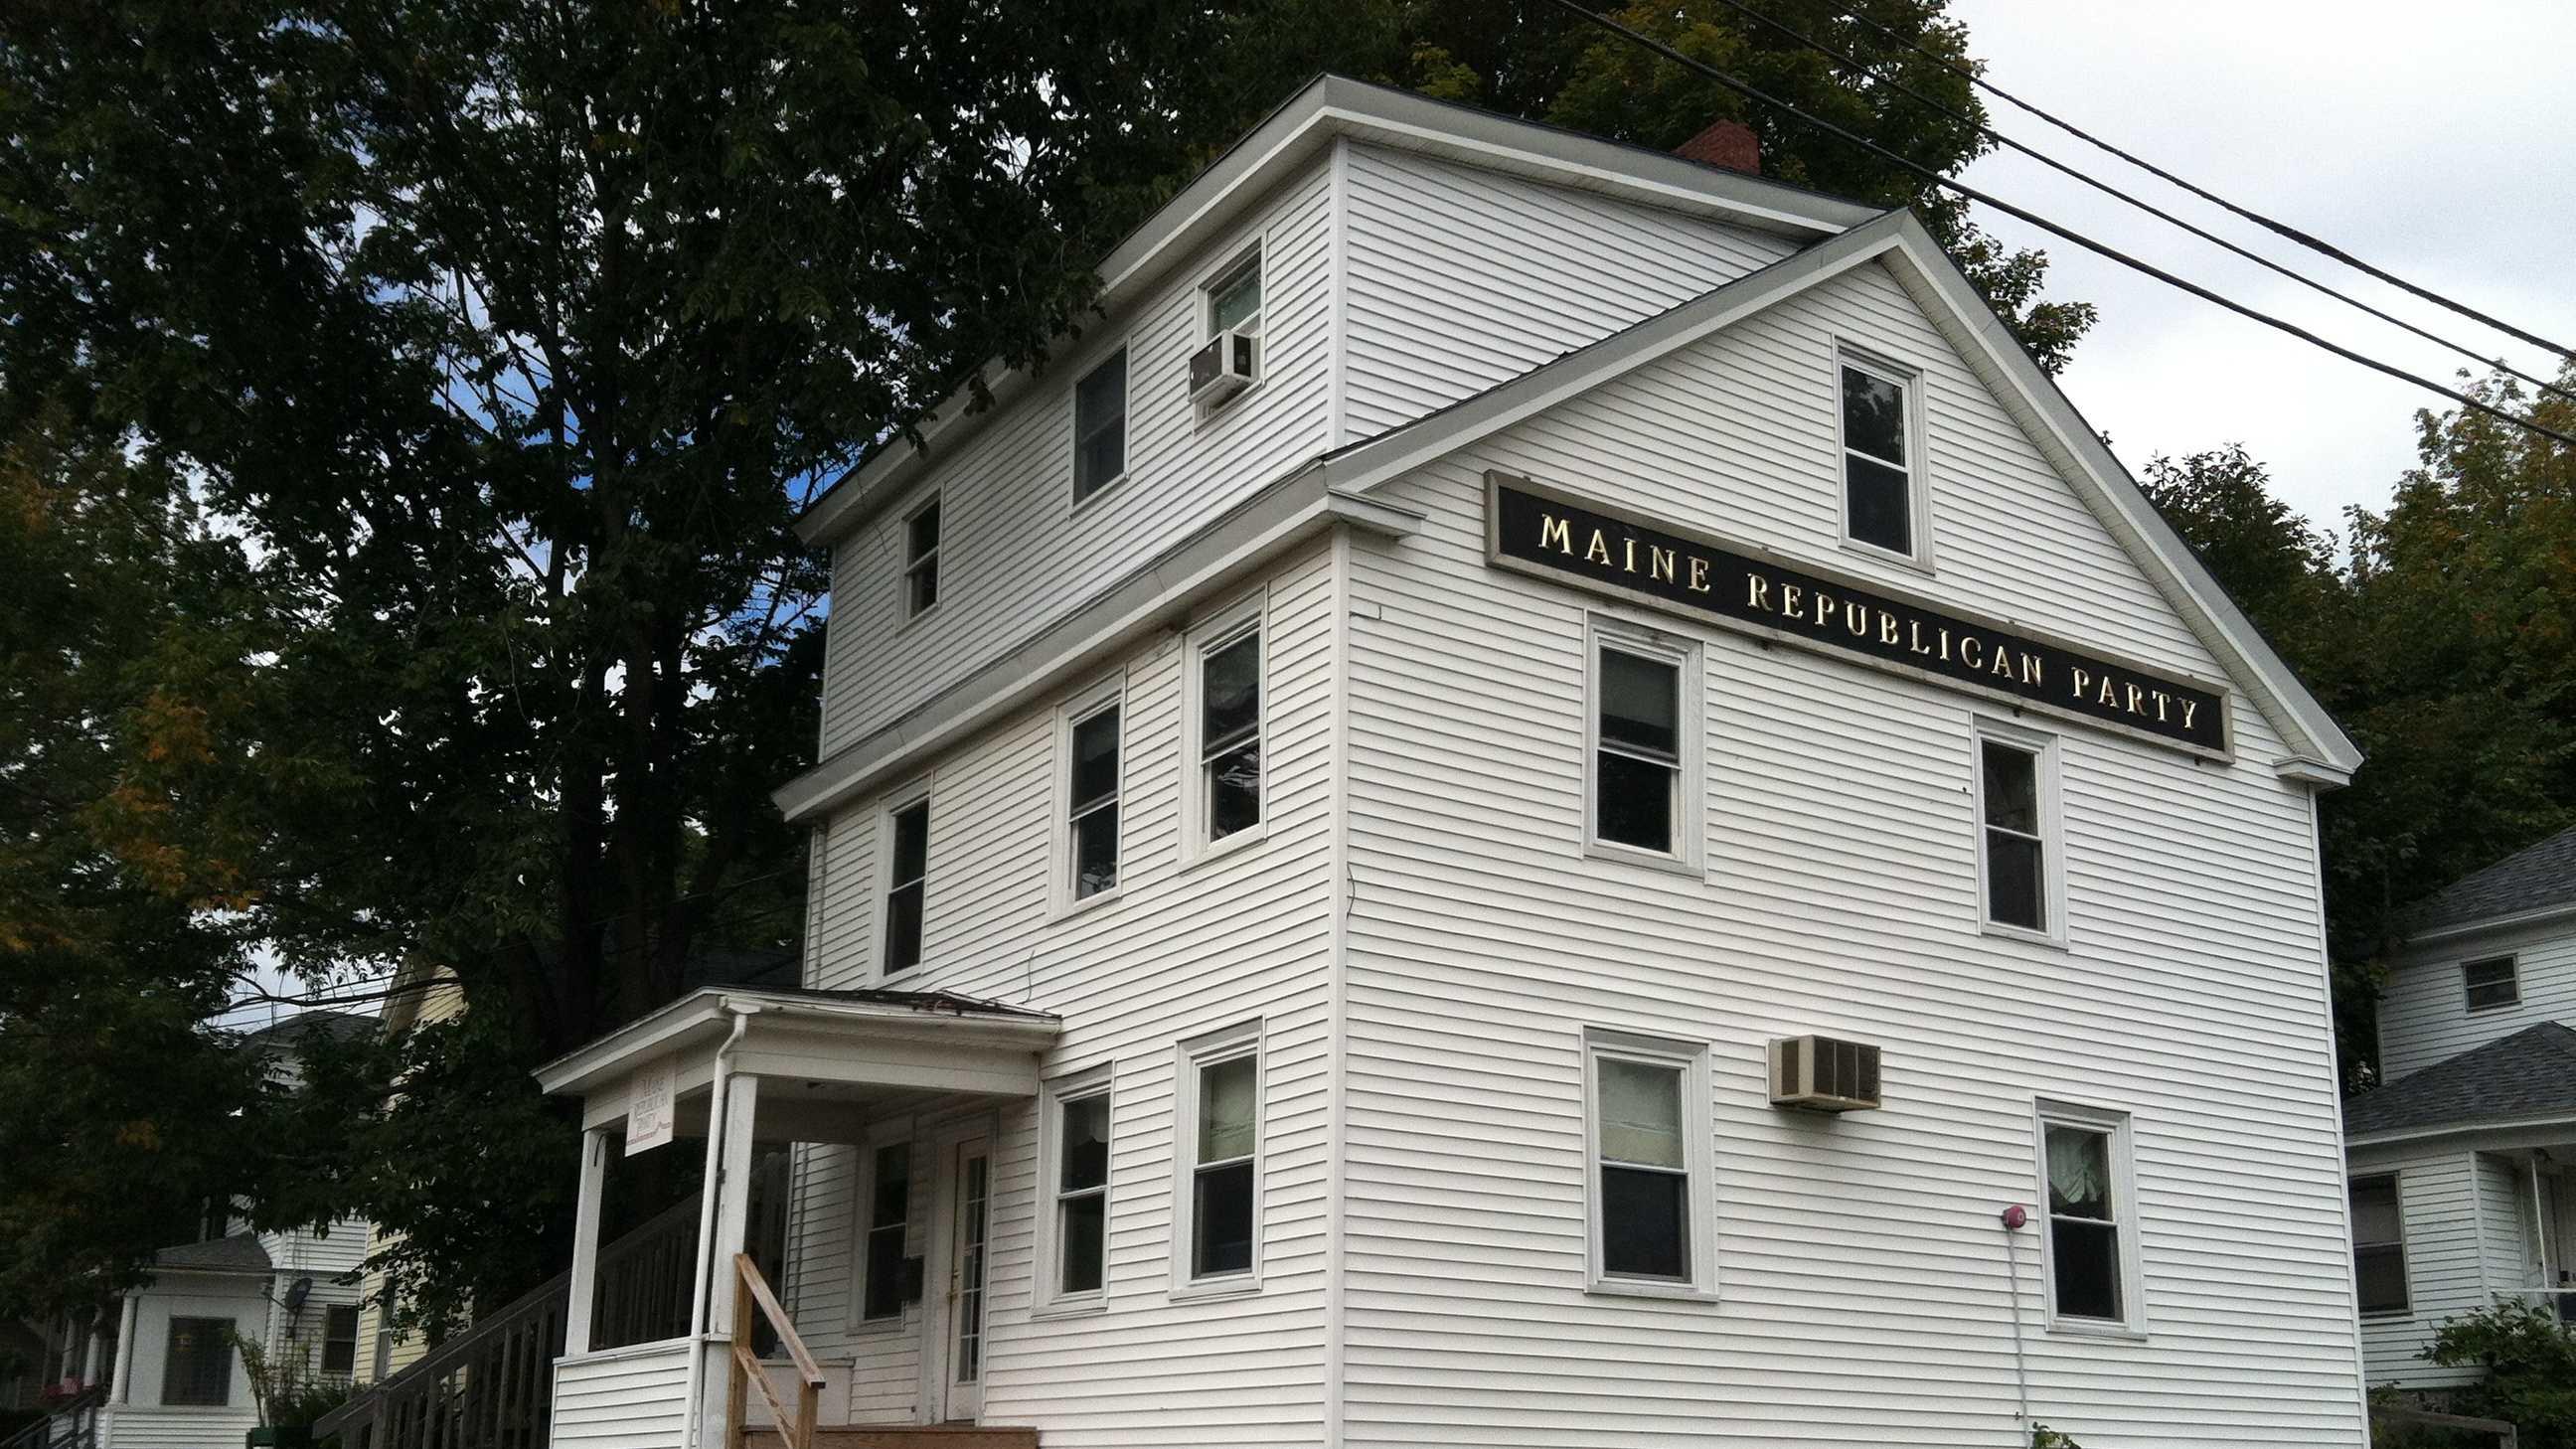 Maine Republican Party Headquarters.JPG